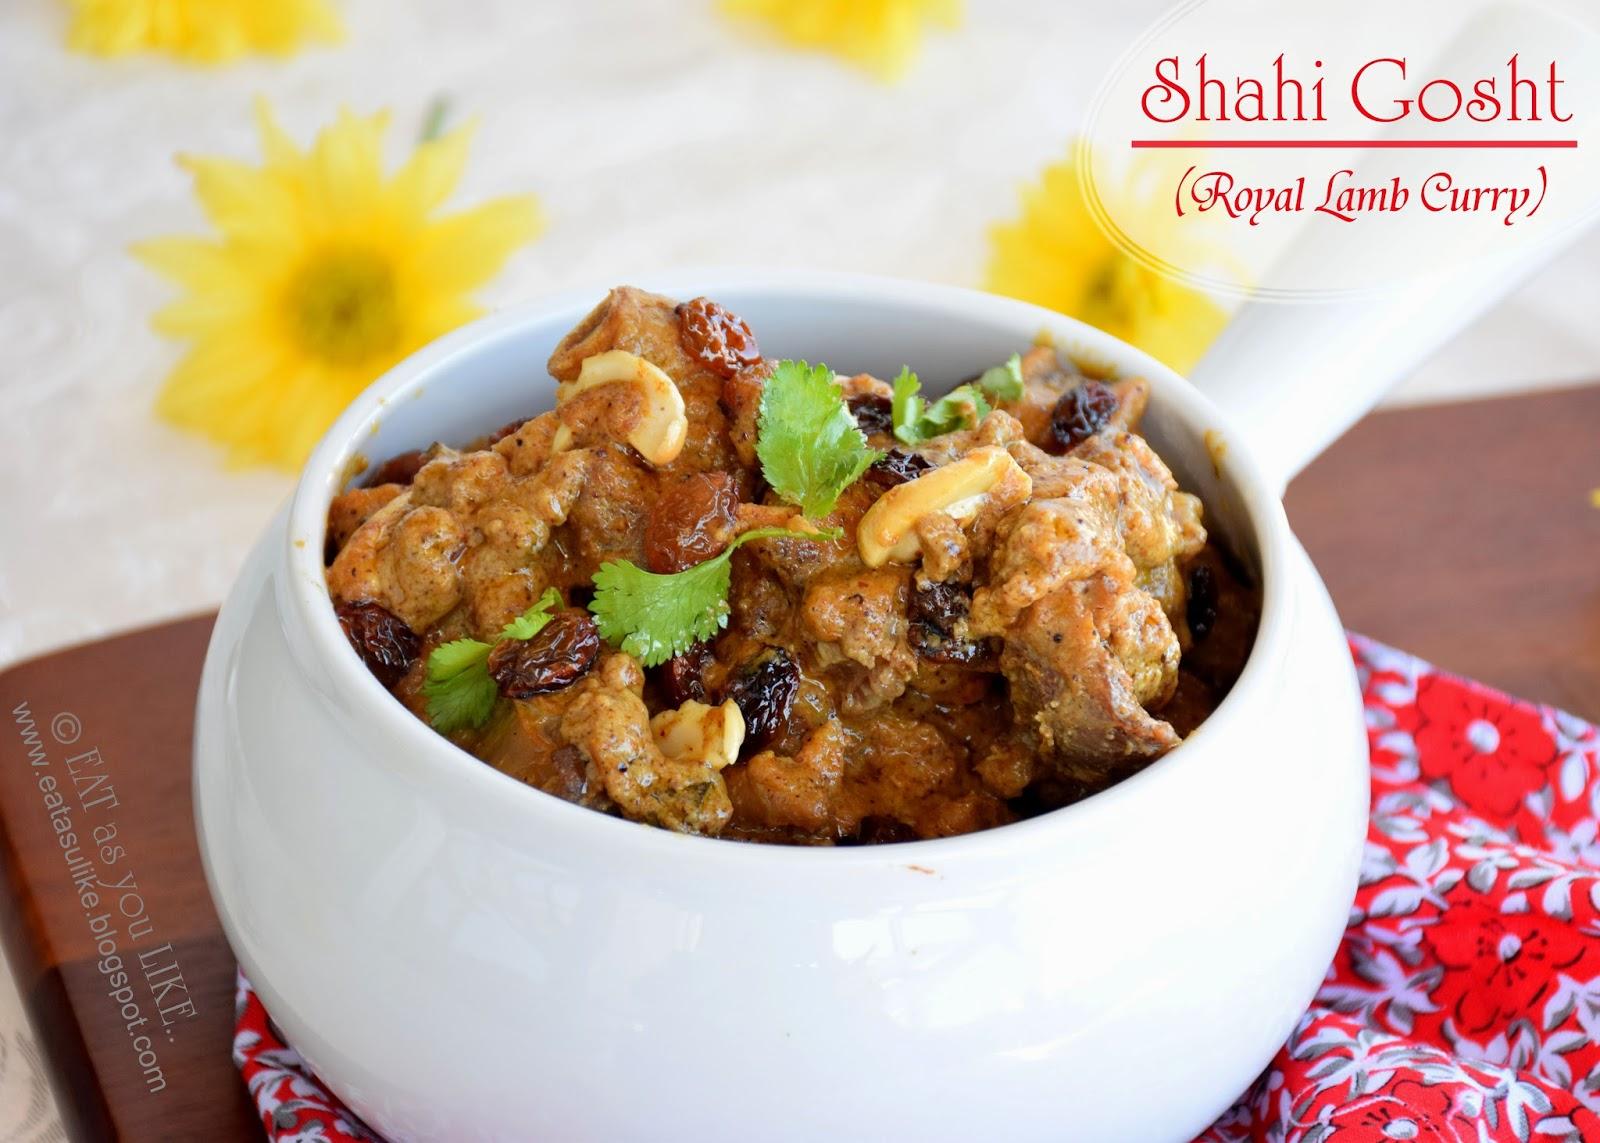 http://eatasulike.blogspot.com.au/2014/09/shahi-goshtroyal-lamb-curryshahi-mutton.html